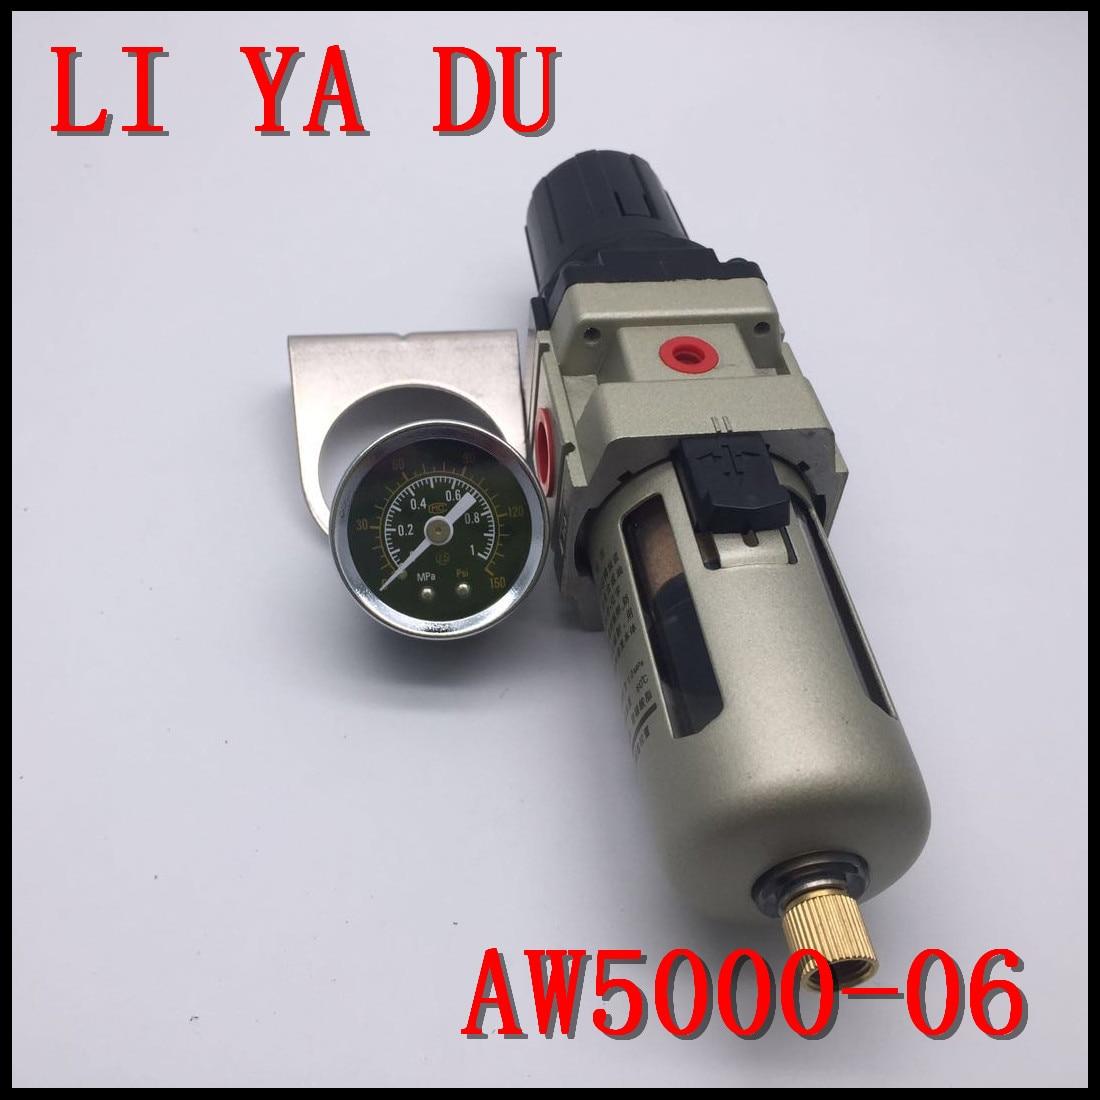 AW5000 06 G3/4 Pneumatic air compressor filter pressure reducing valve regulating valve